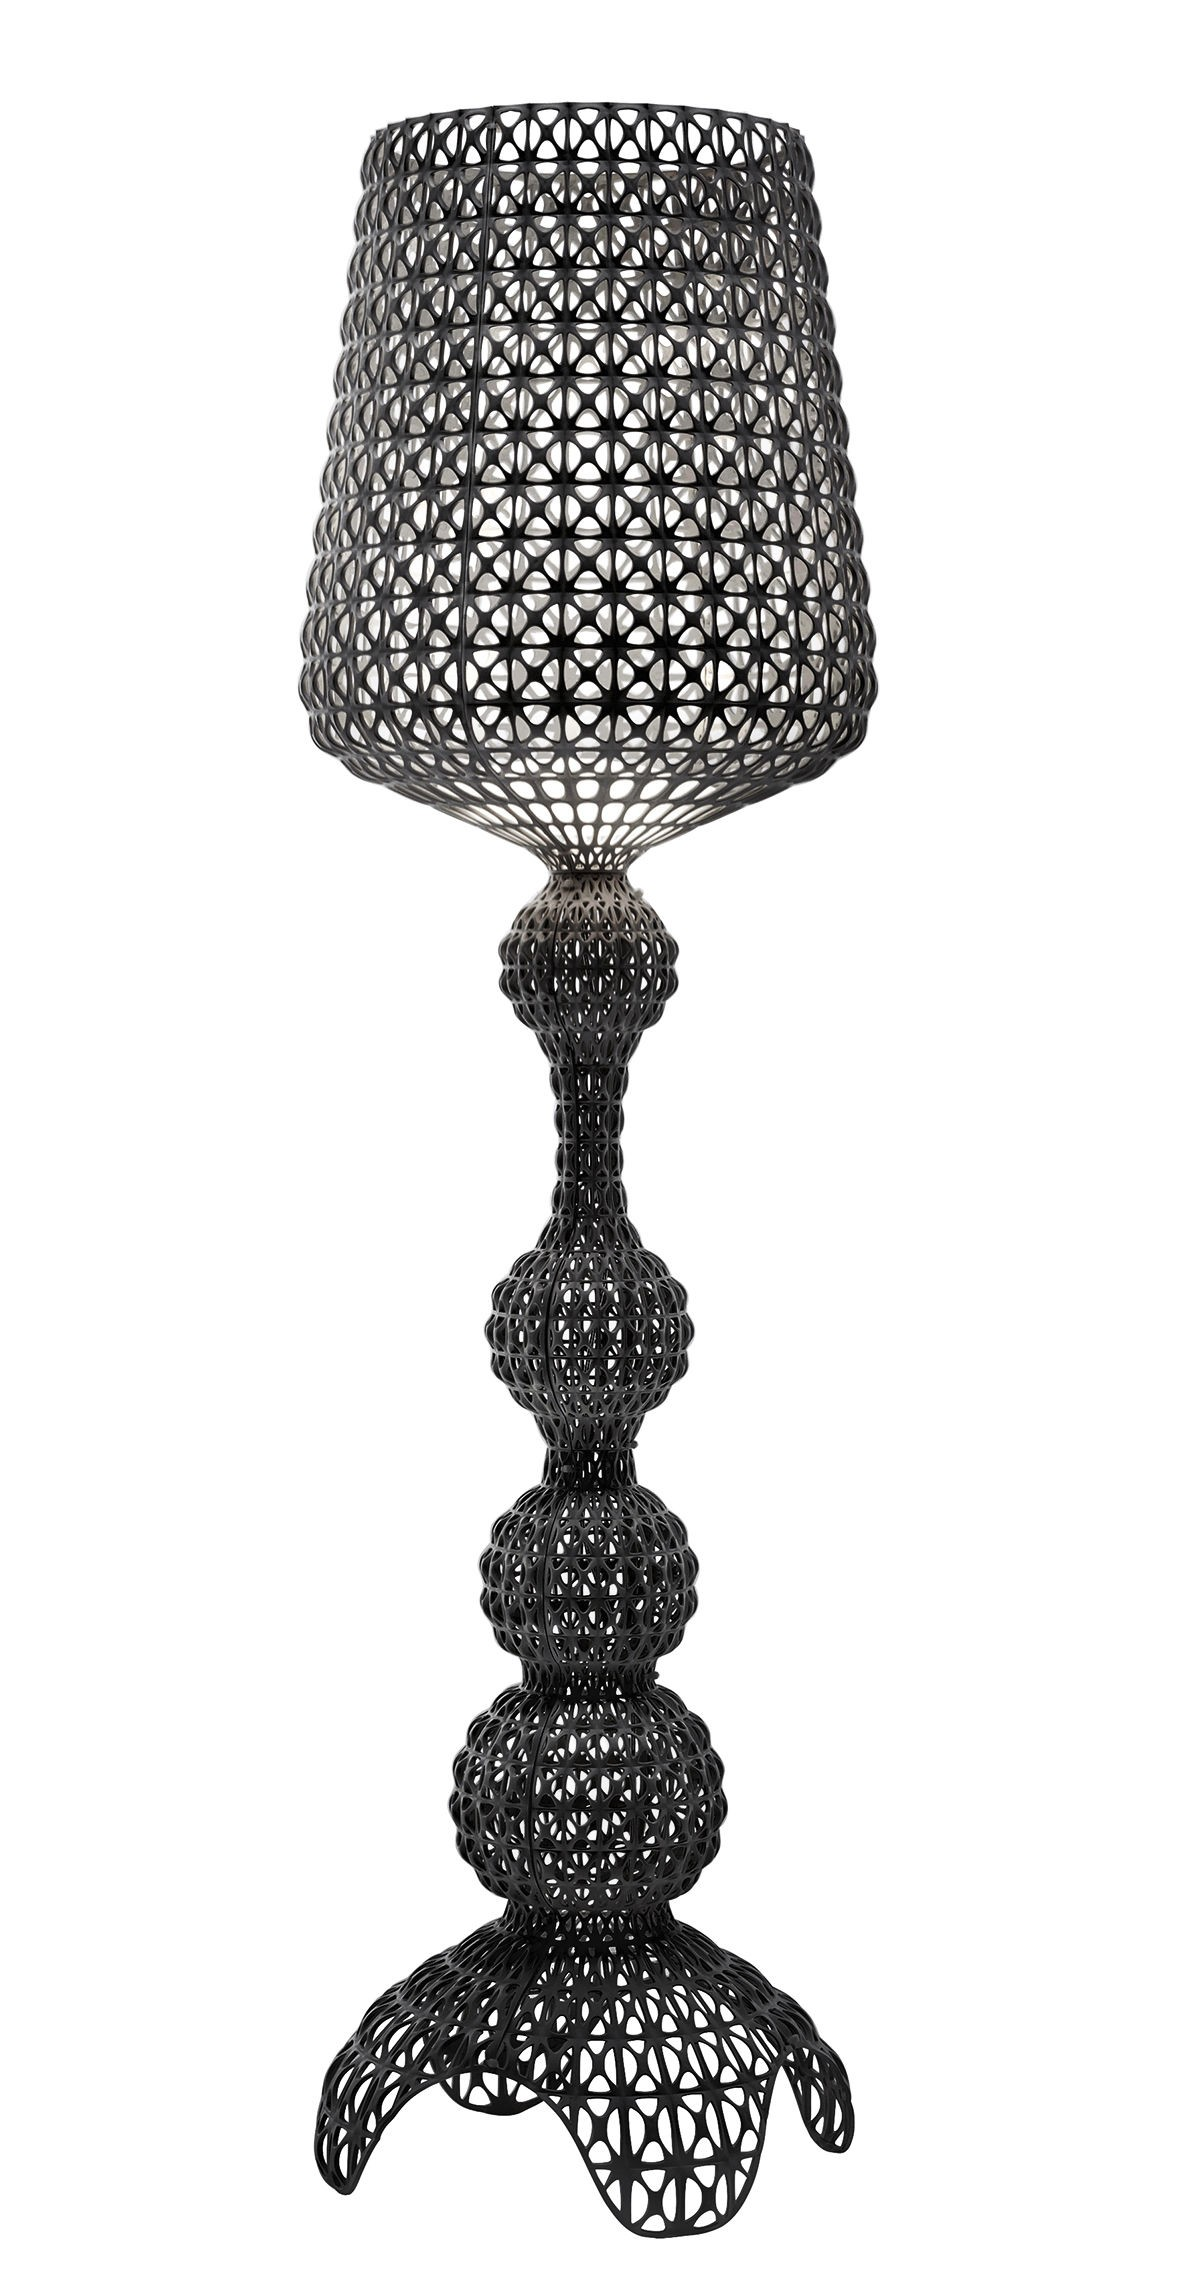 lampadaire kabuki de kartell 5 coloris. Black Bedroom Furniture Sets. Home Design Ideas